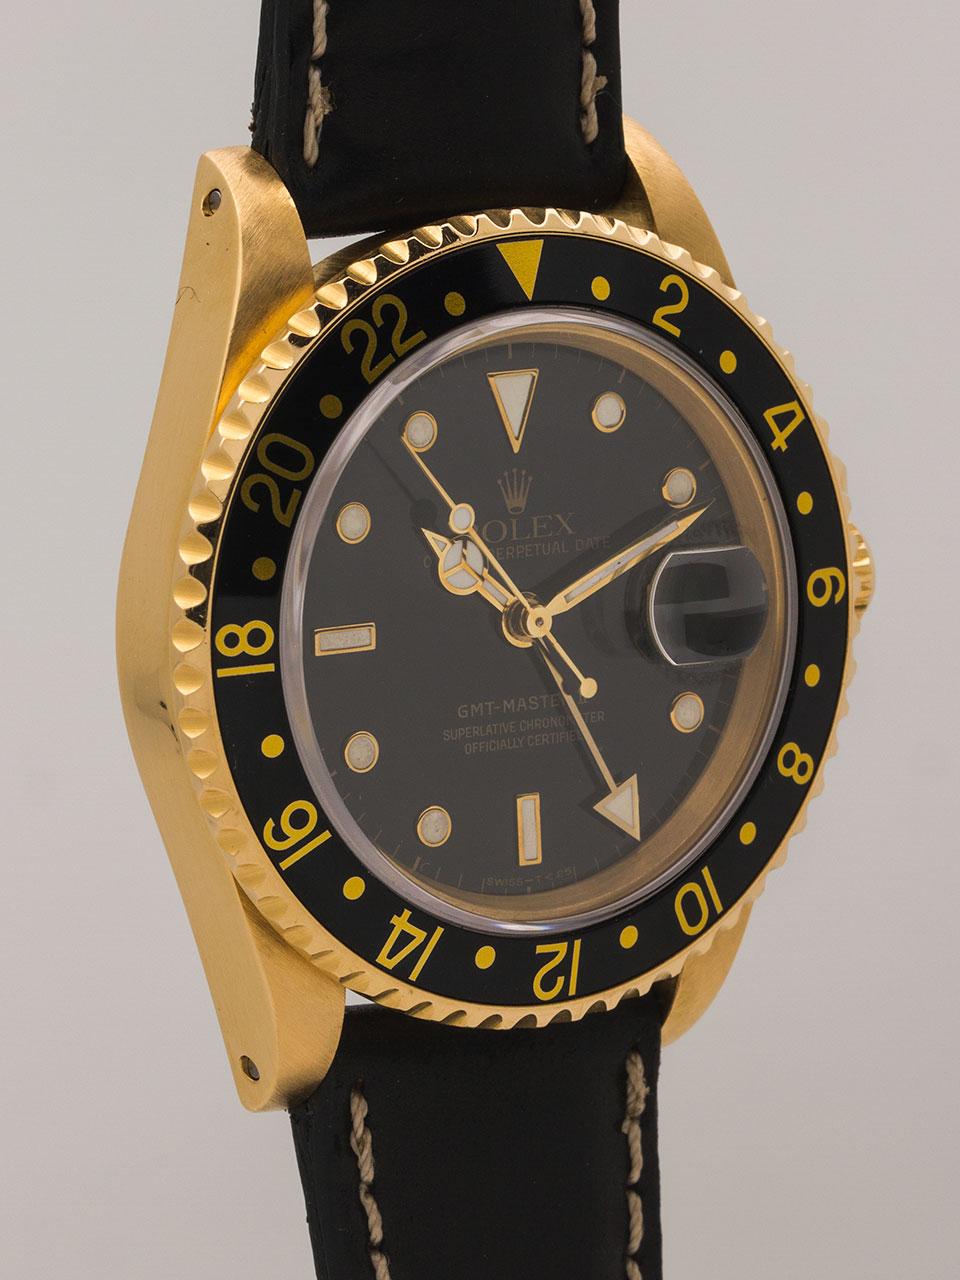 Rolex GMT 18K YG ref 16718 circa 1988